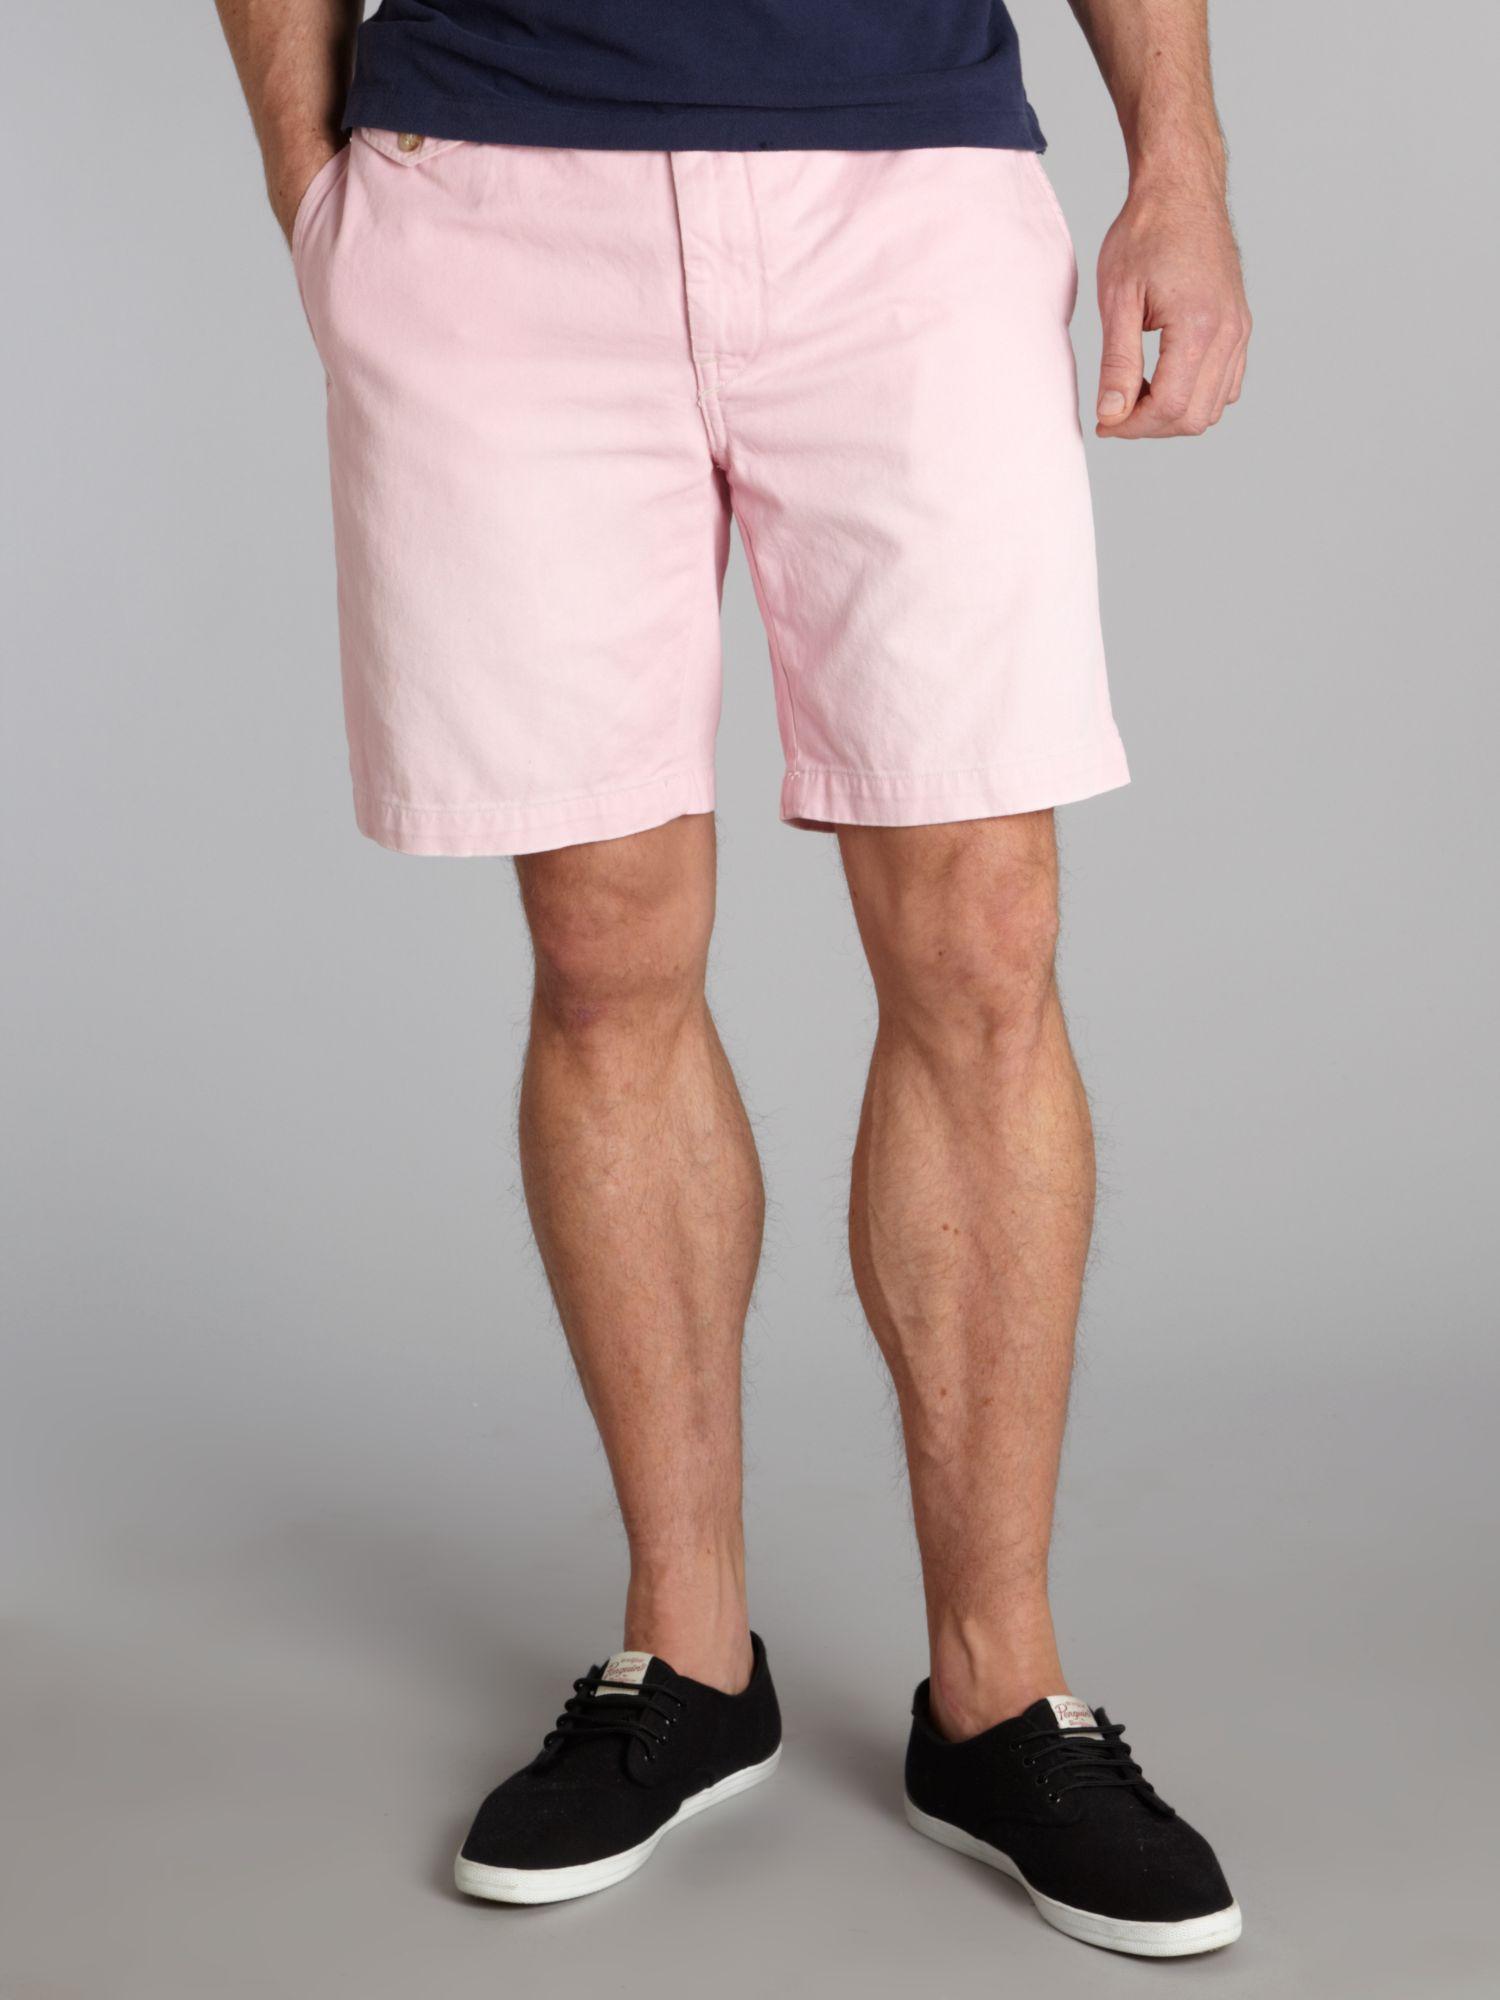 Cheap Jean Shorts For Men